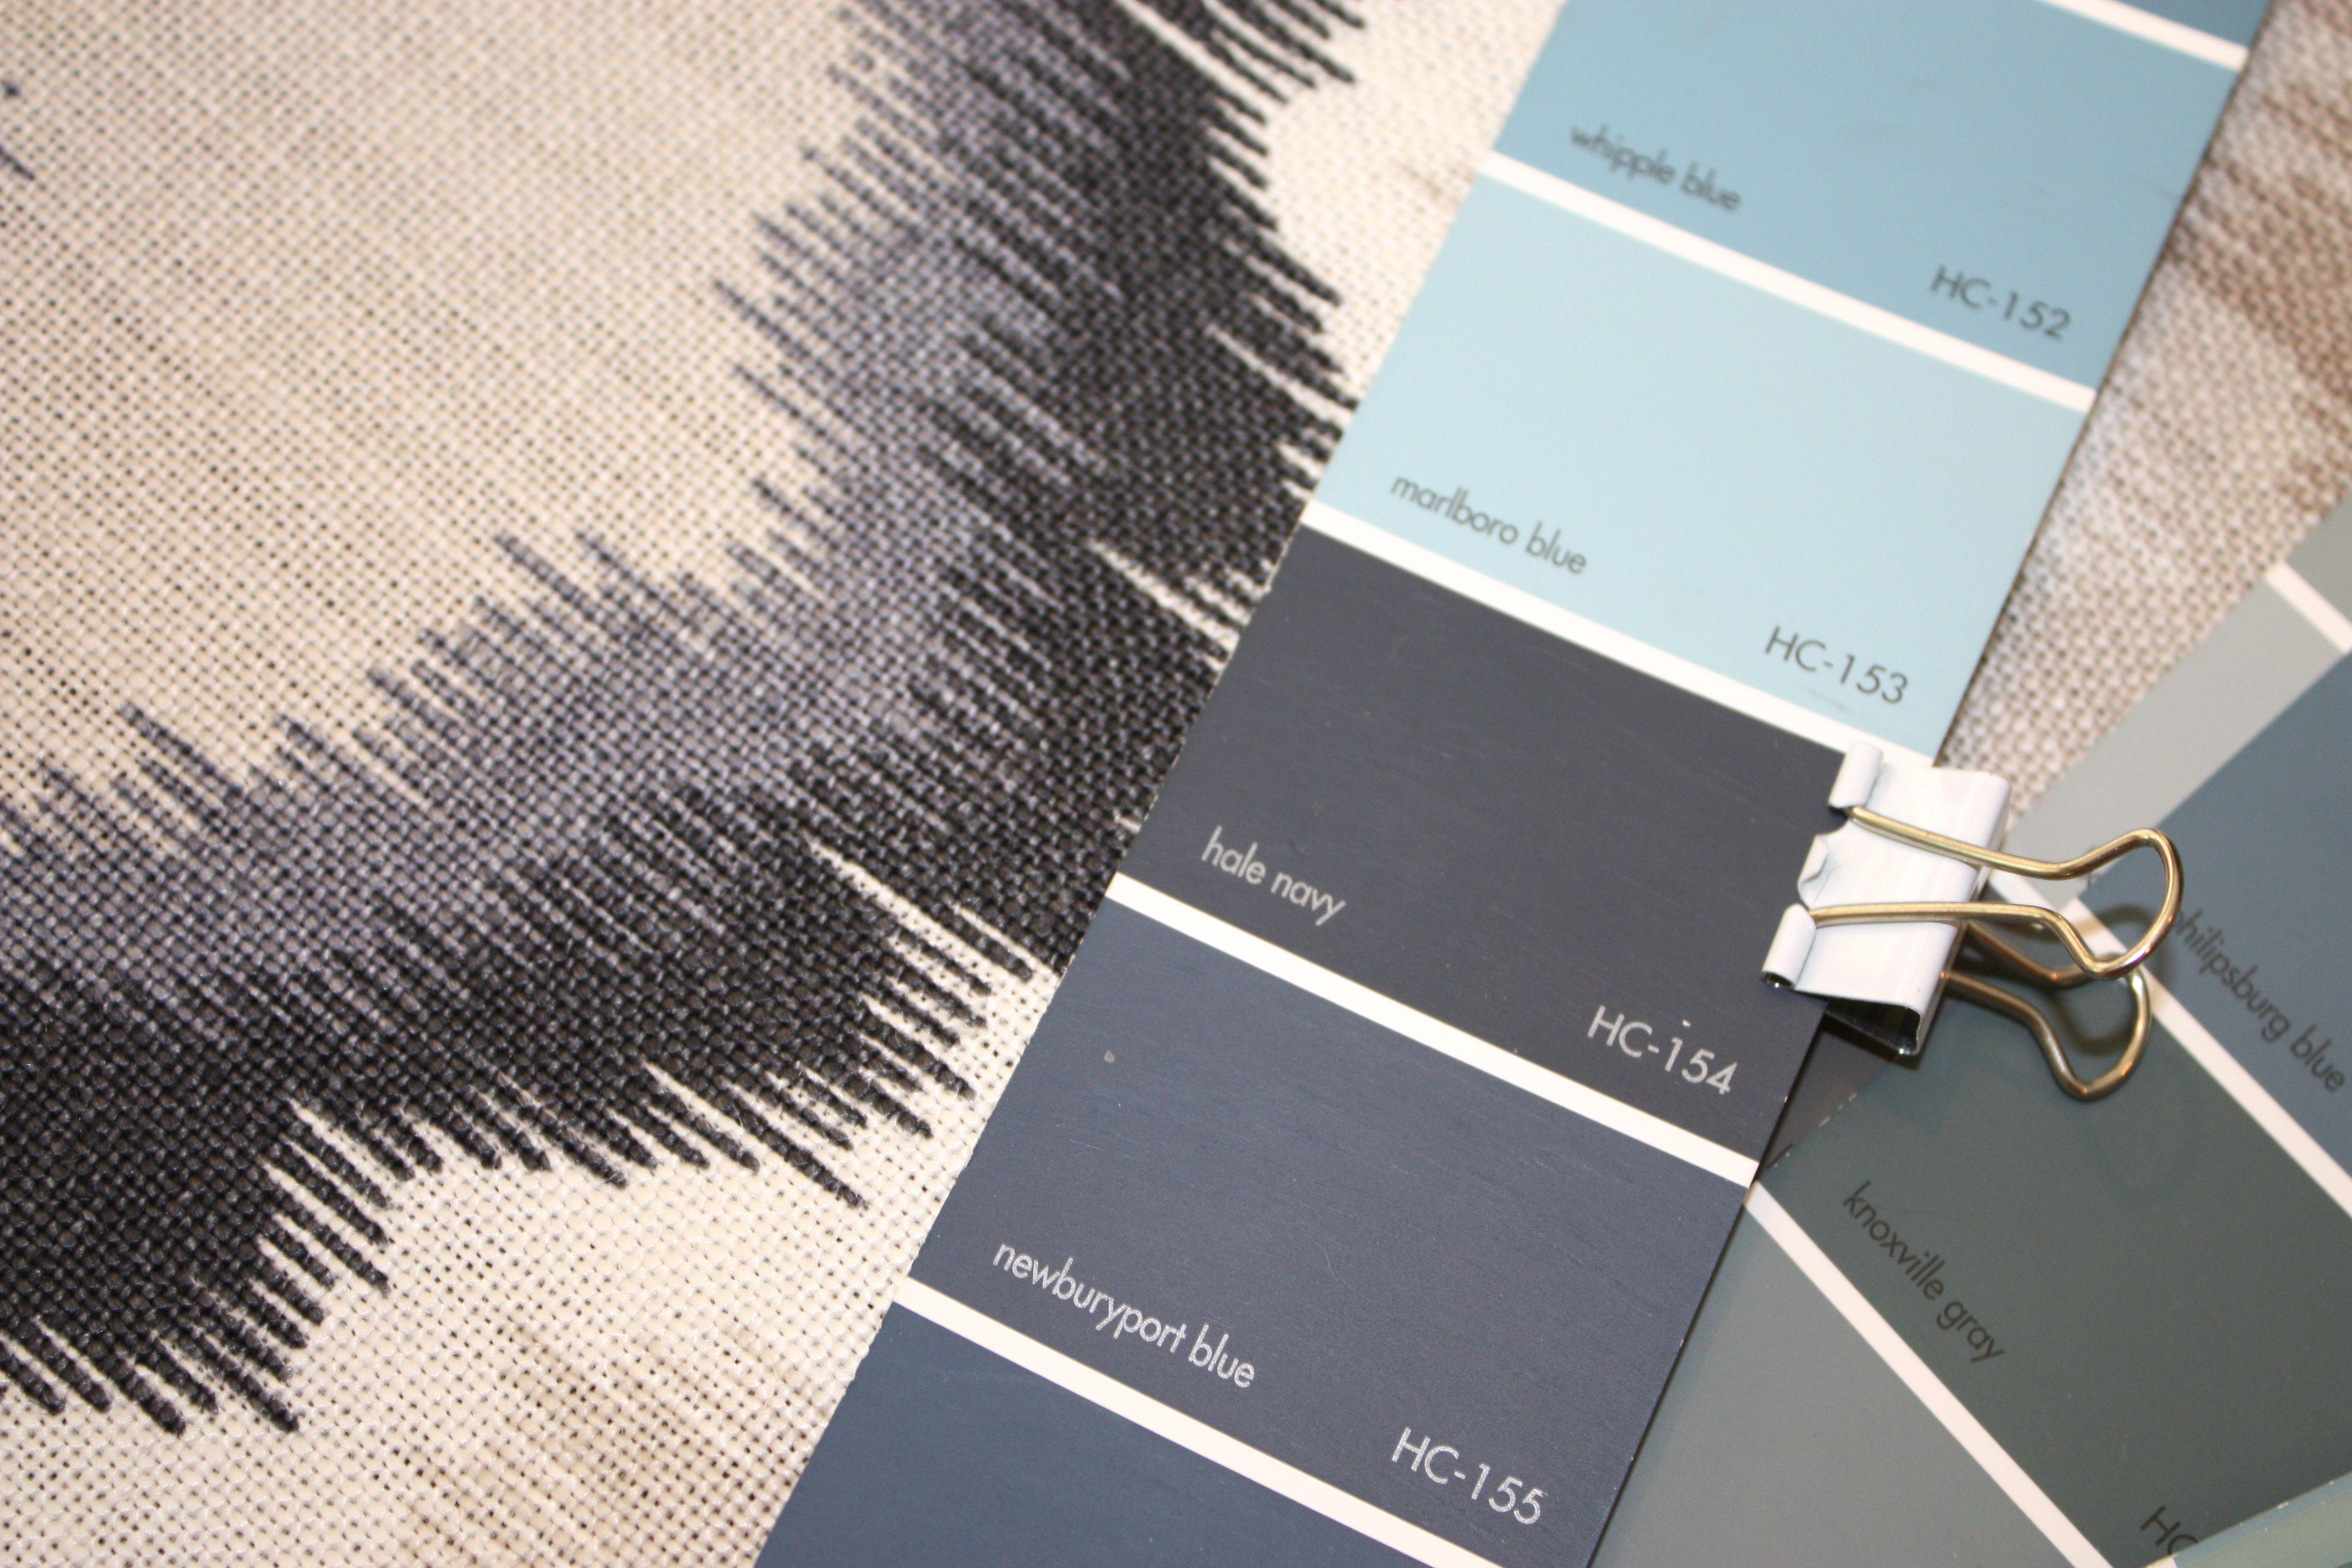 how to choose a paint colorChoosing a Paint Color Palette Using Fabric Inspiration